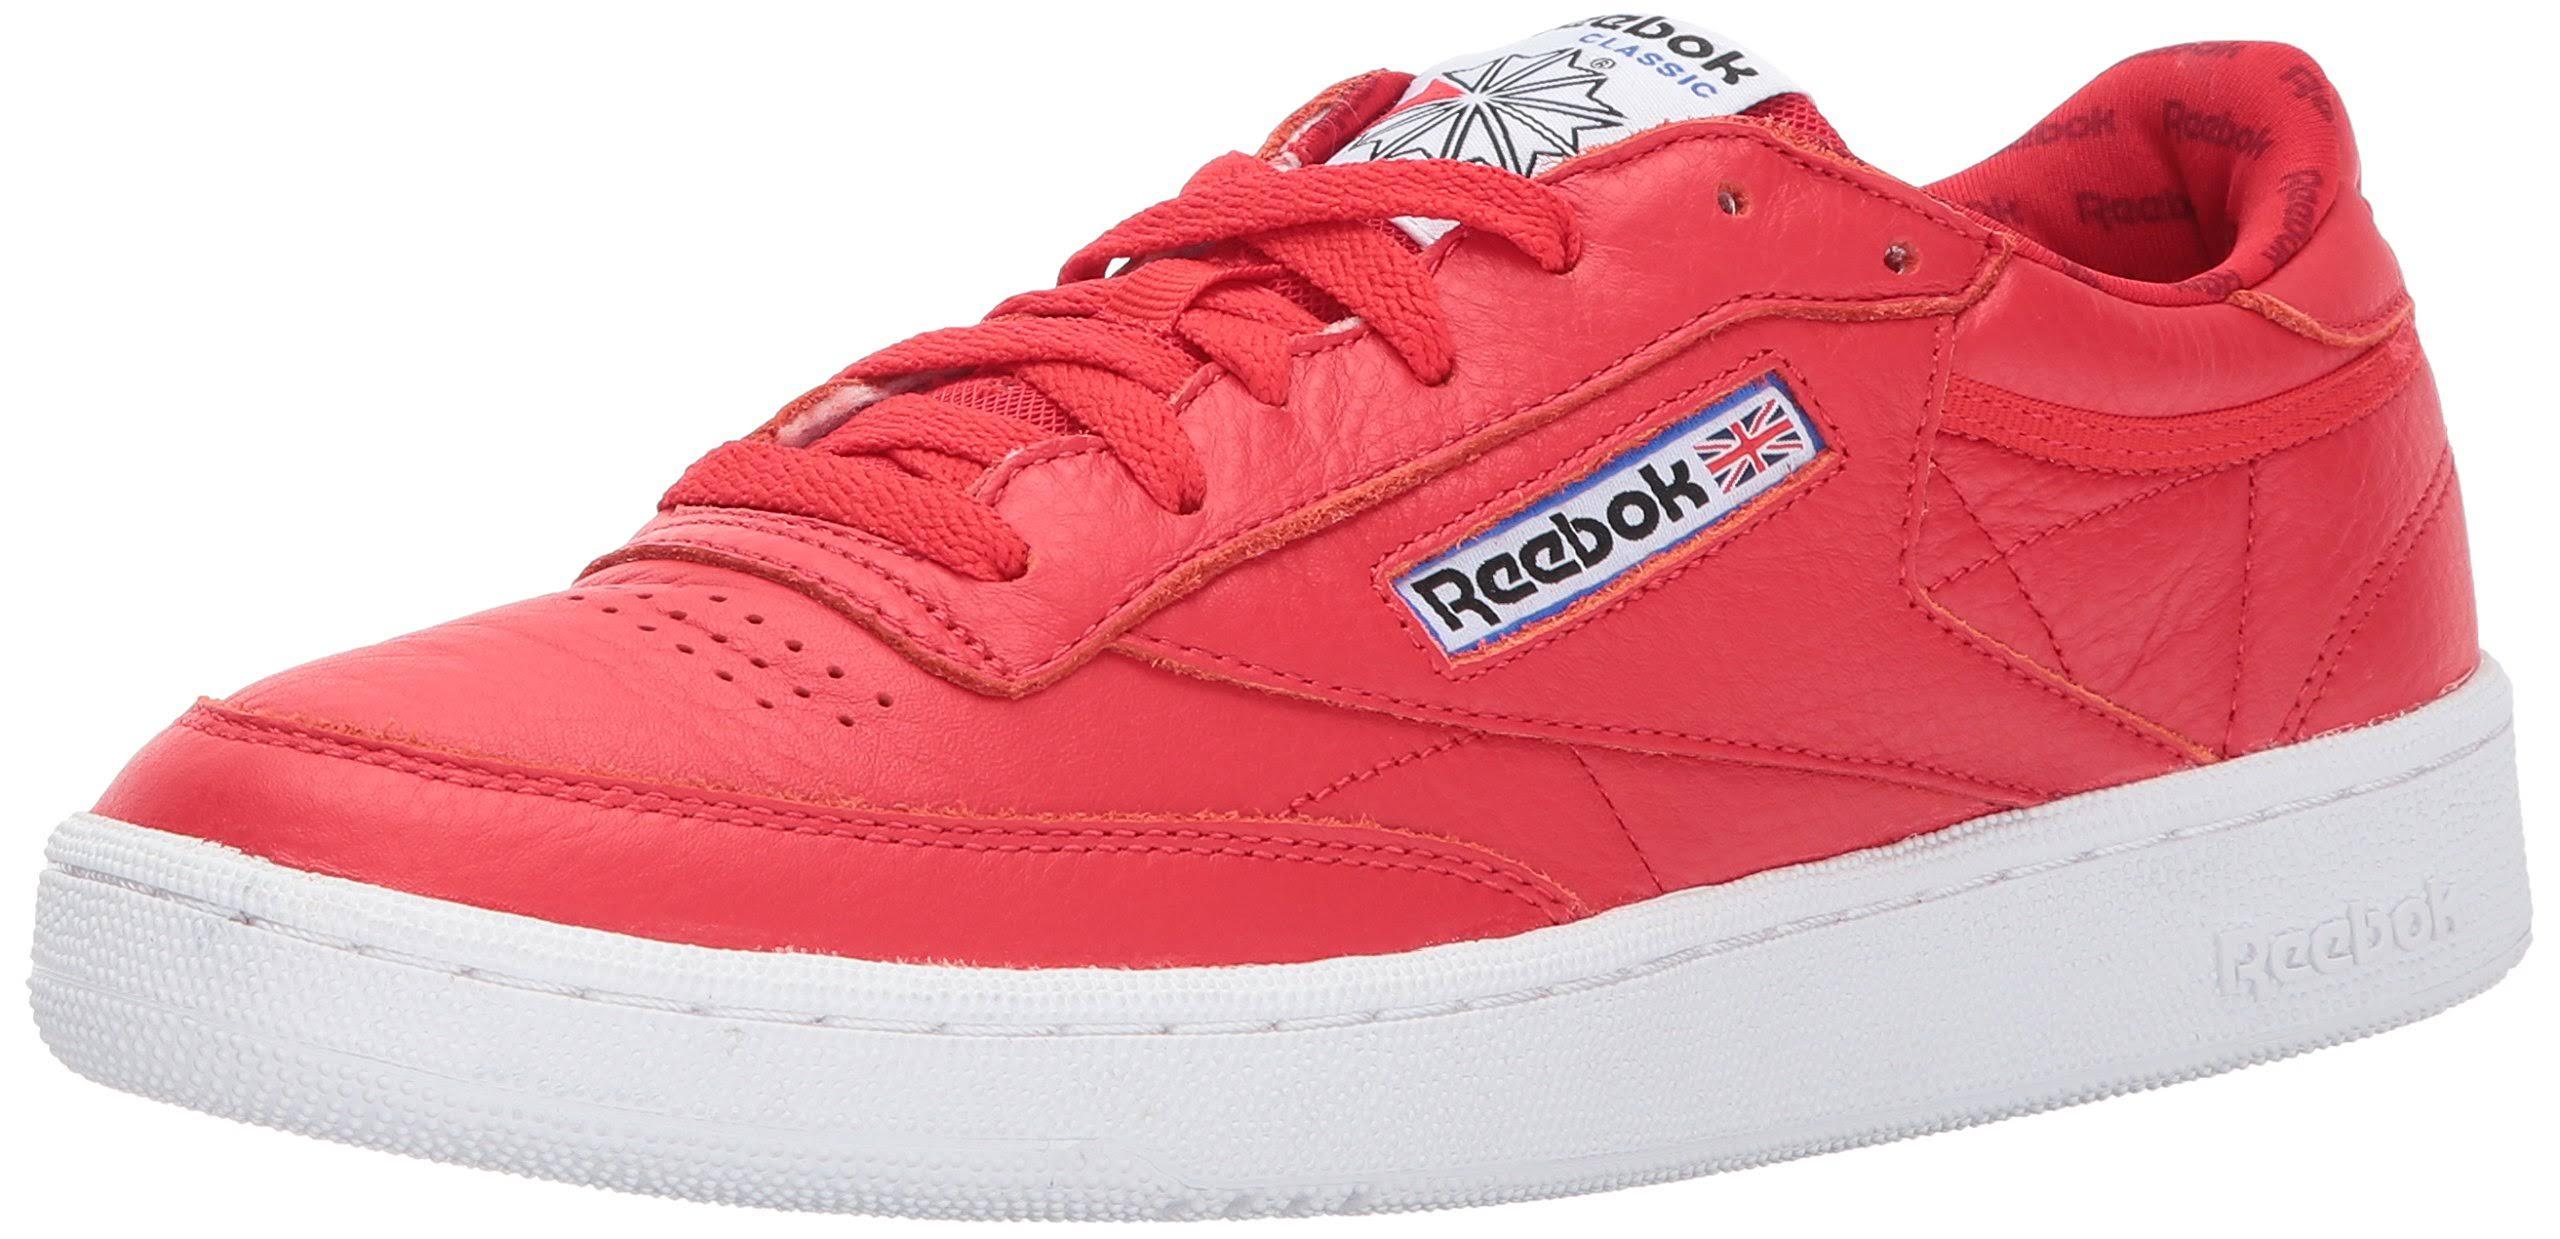 C Männerclub 85 Primal Reebok Schwarz Fashion Sneaker So White TPwSqZ5q